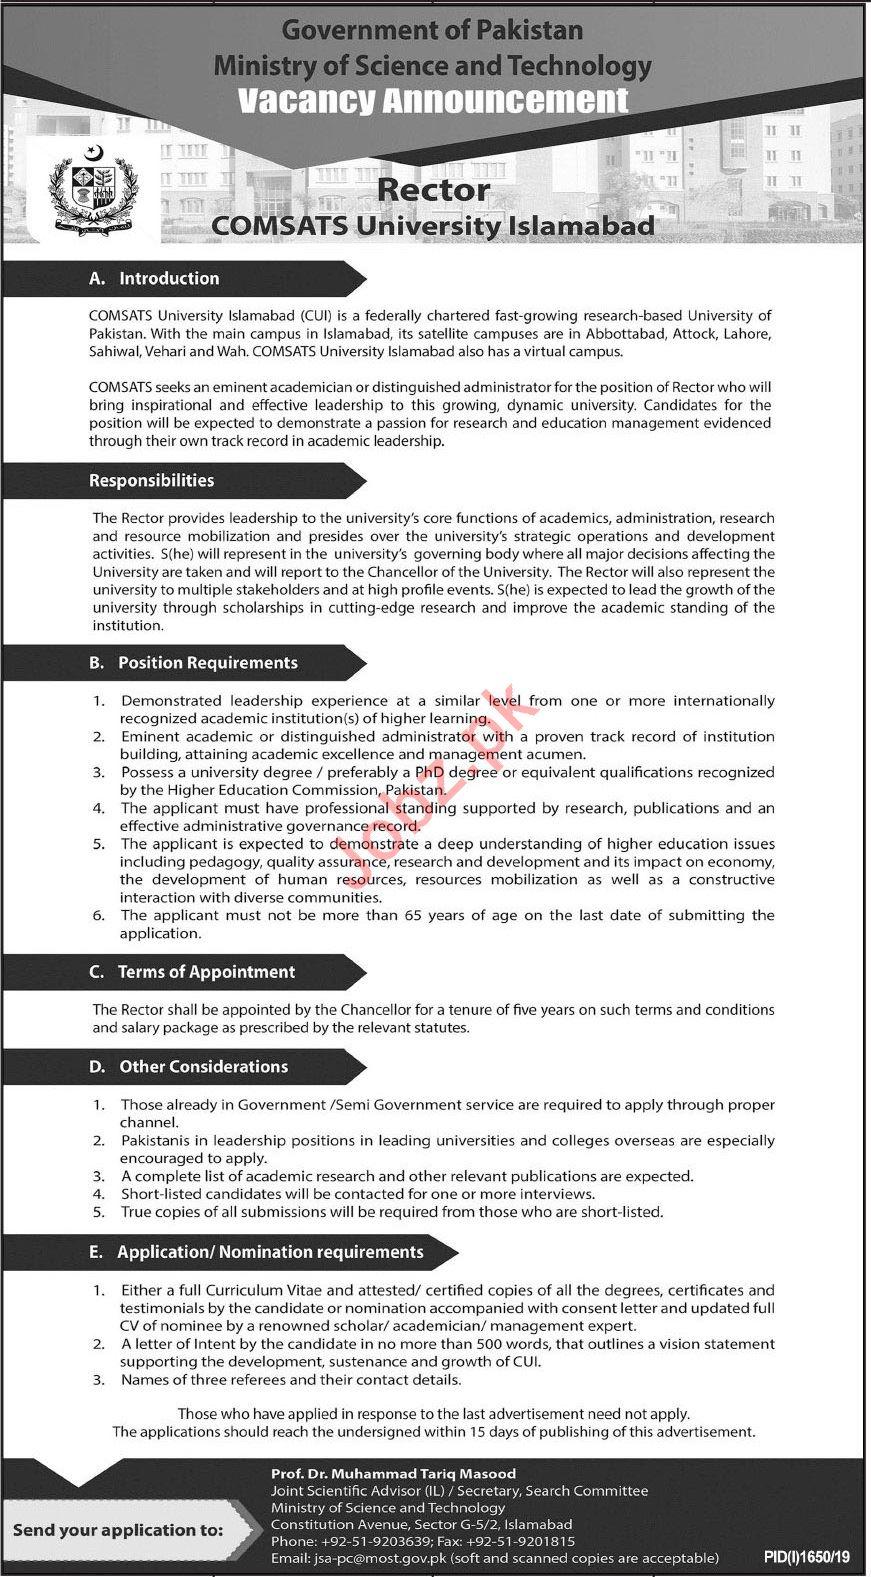 COMSATS University Islamabad CUI Job For Rector